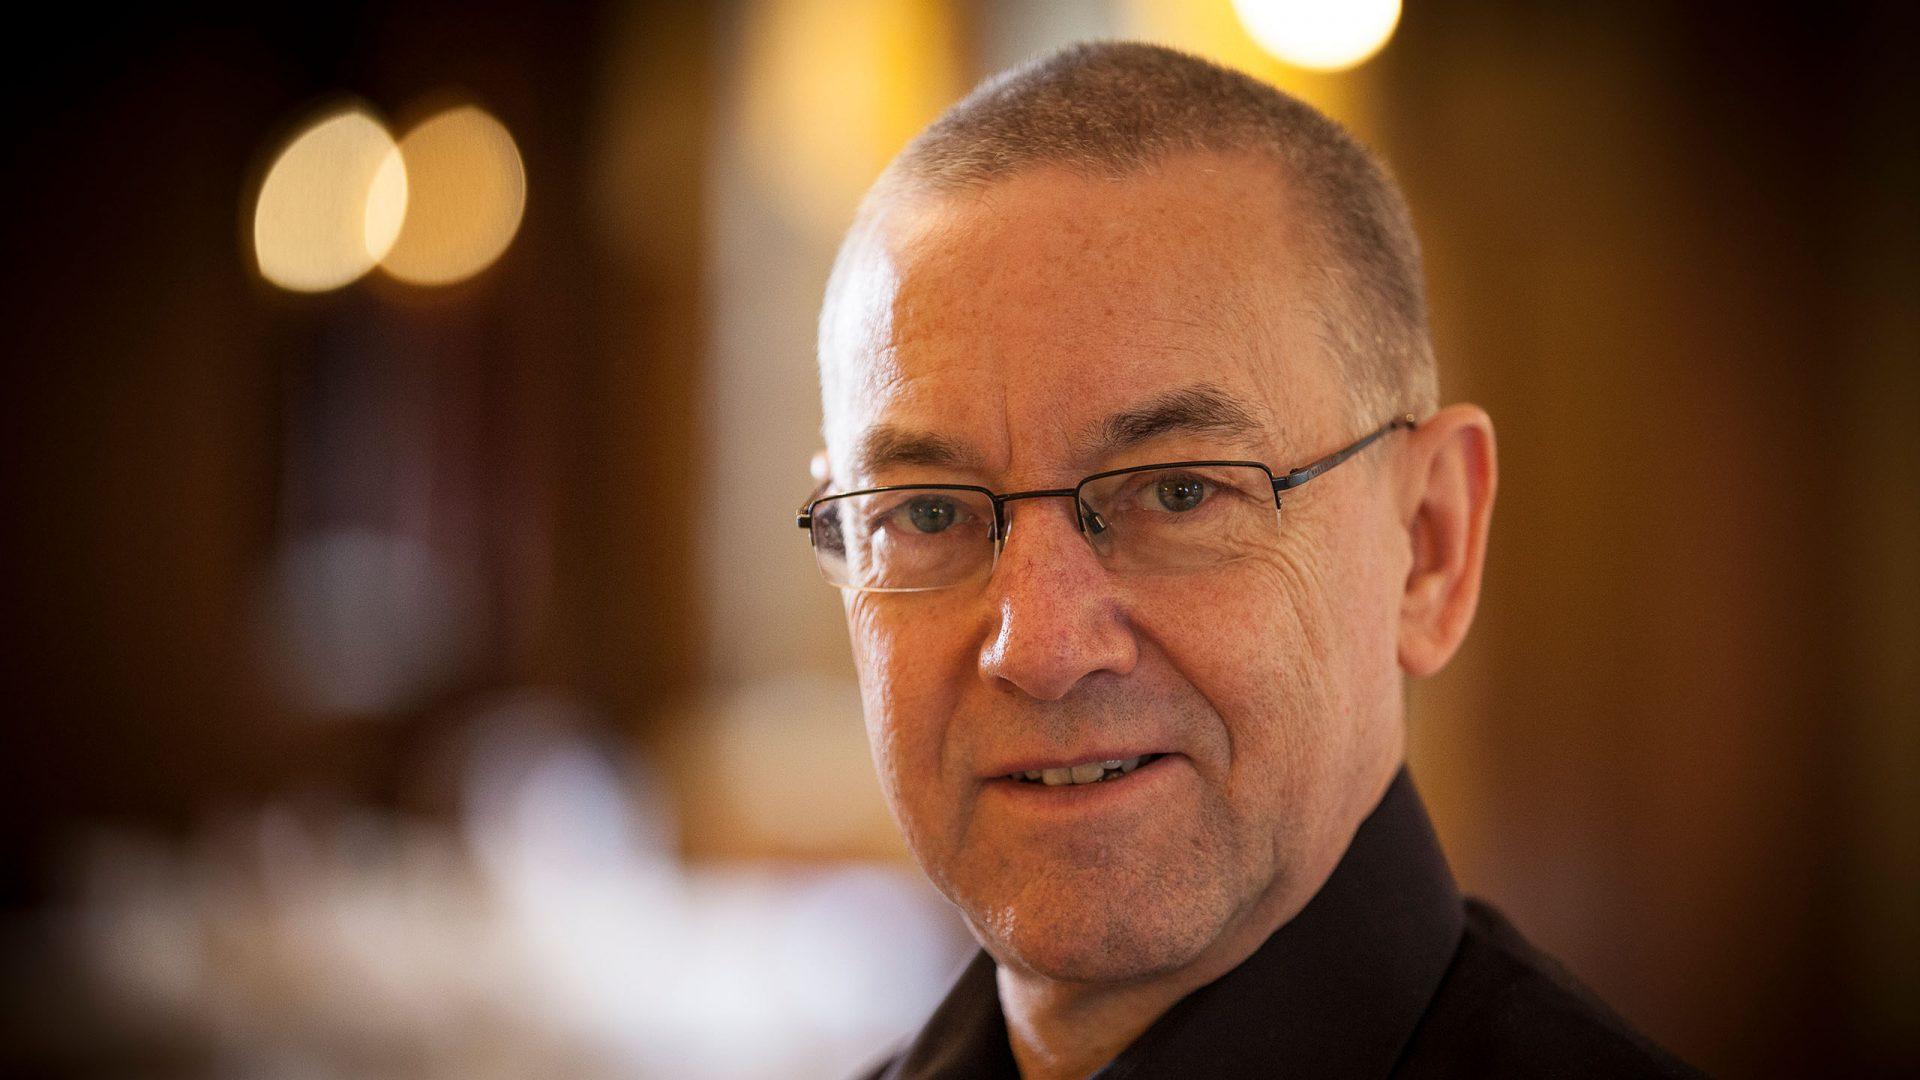 Prof. Dr. Vilgis